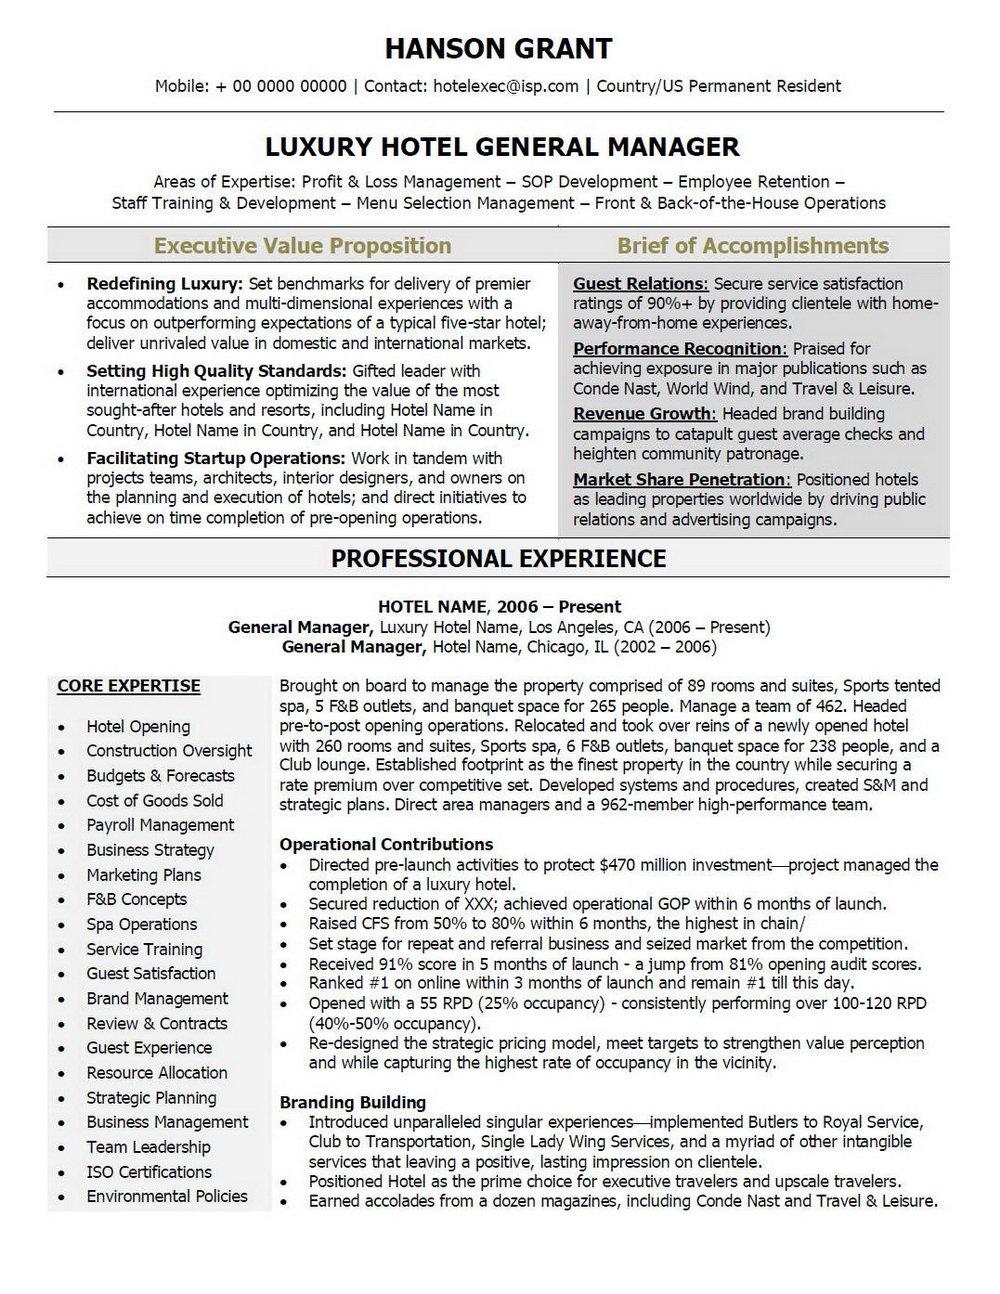 Resume Writing Services Long Island Ny